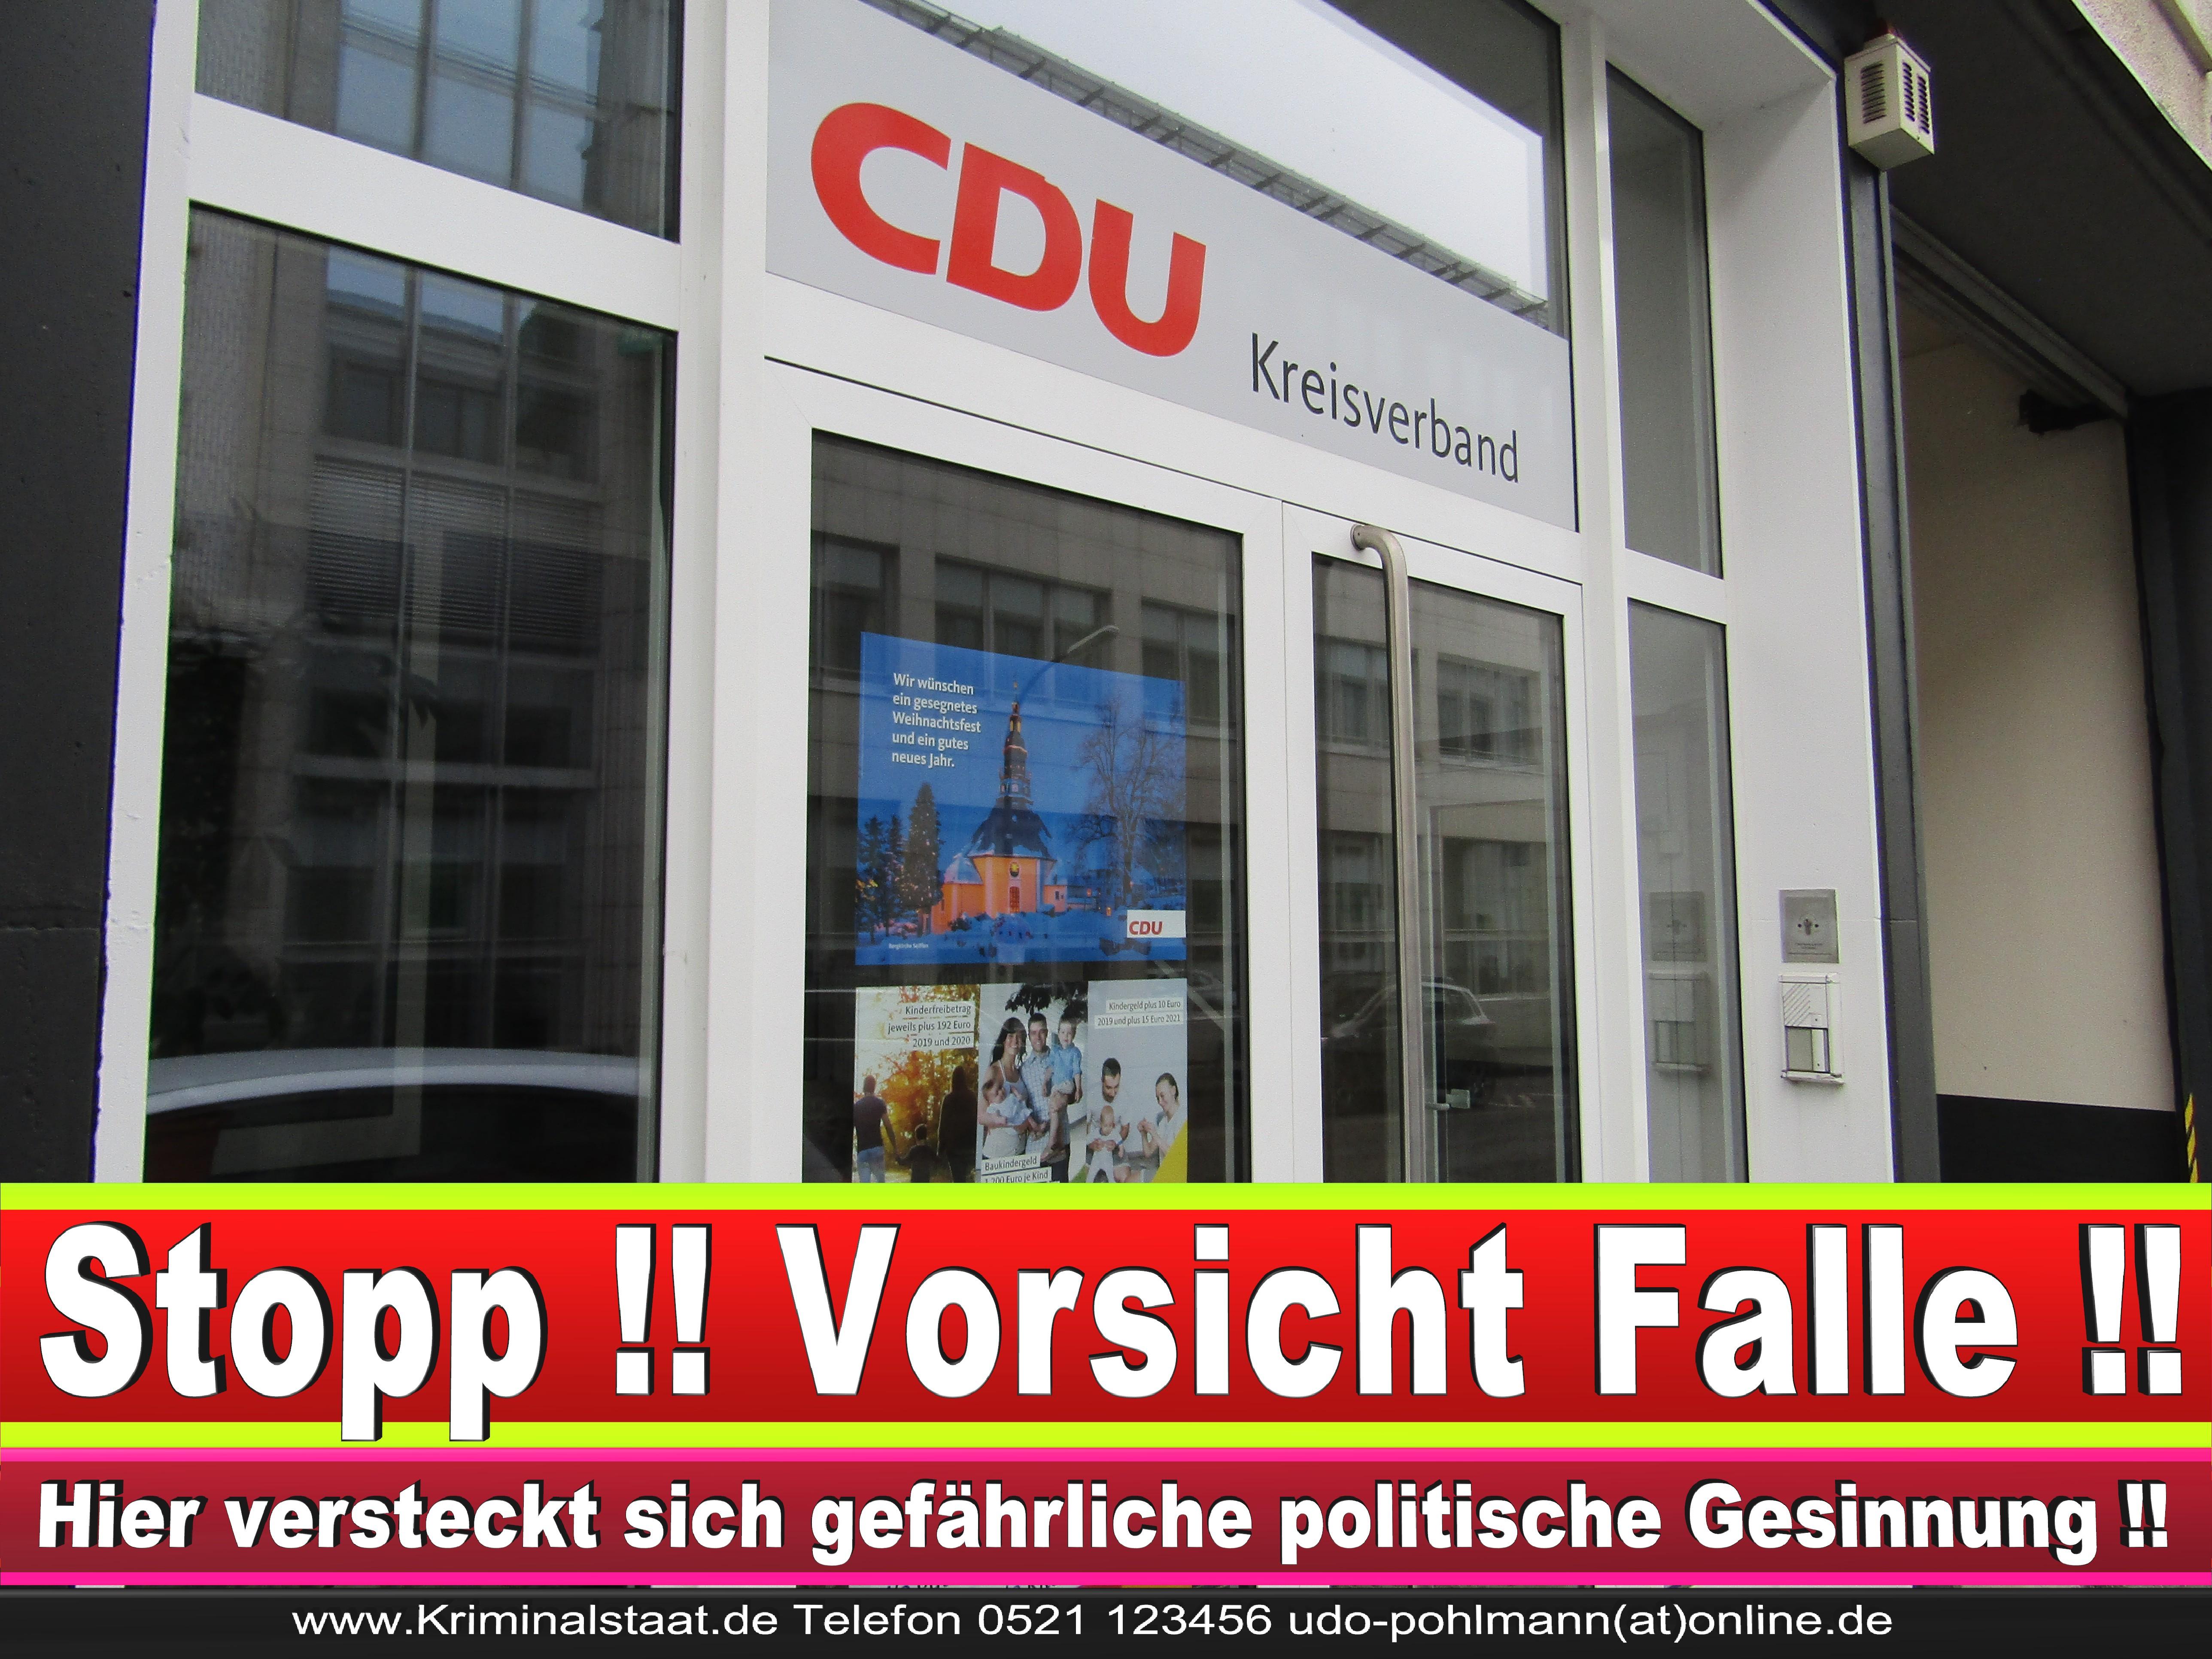 CDU DORTMUND KREISVERBAND BüRGERBüRO CDU FRAKTION ORTSVERBAND CDU NRW GESCHäFTSSTELLE ADRESSE RATSMITGLIEDER CDU (12) 1